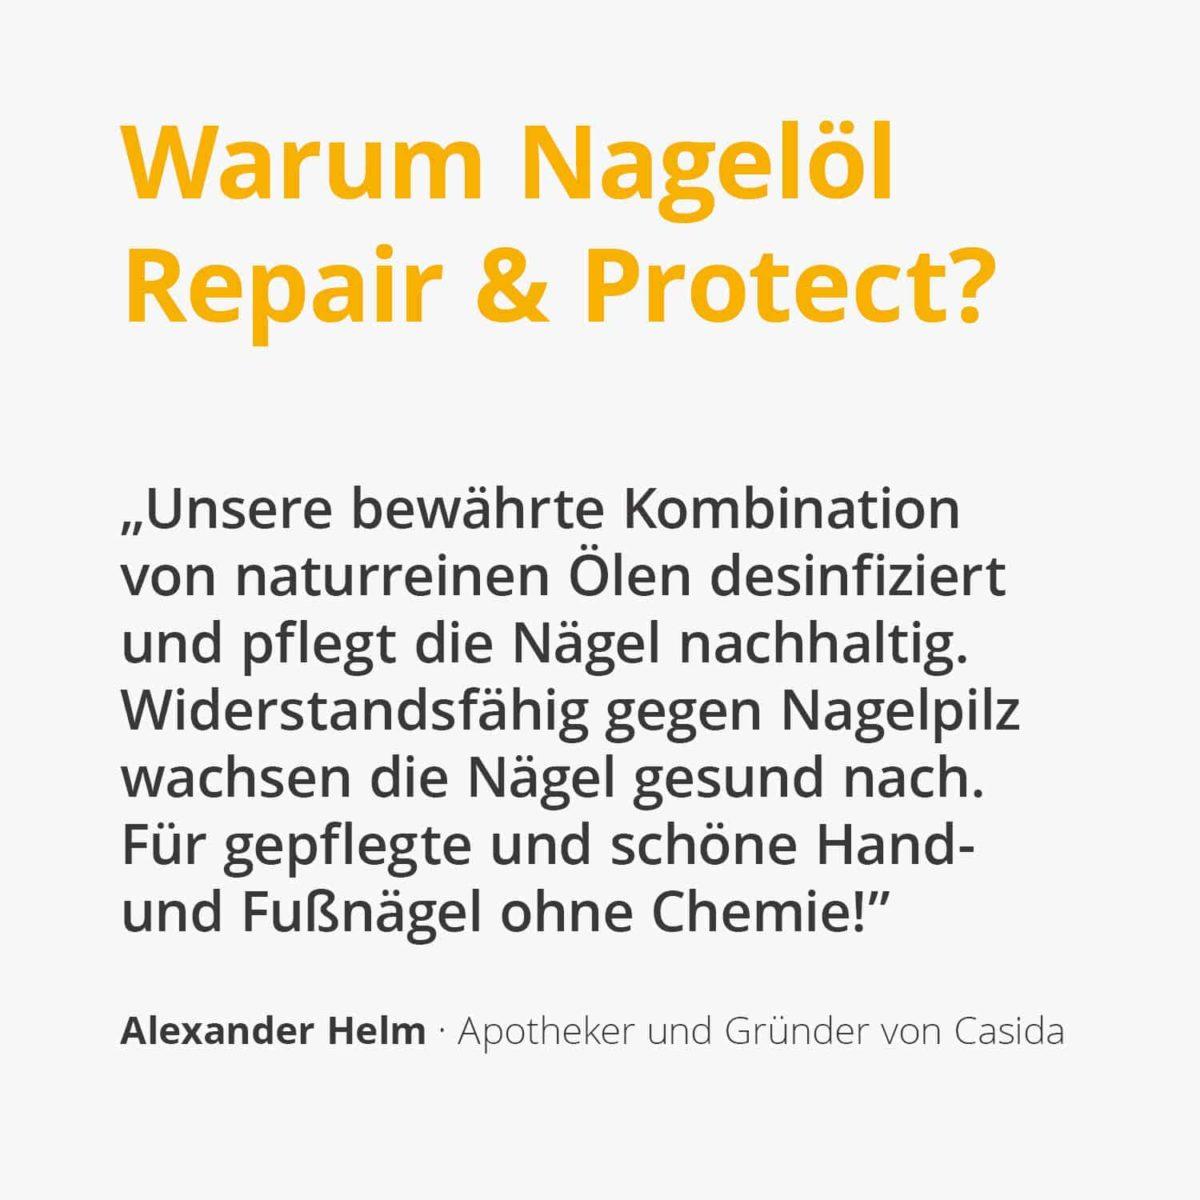 Casida Set 5 +1 Nagelöl Repair & Protect 10 ml PZN 10022445 Apotheke Nagelpilz Füße Hände (2)